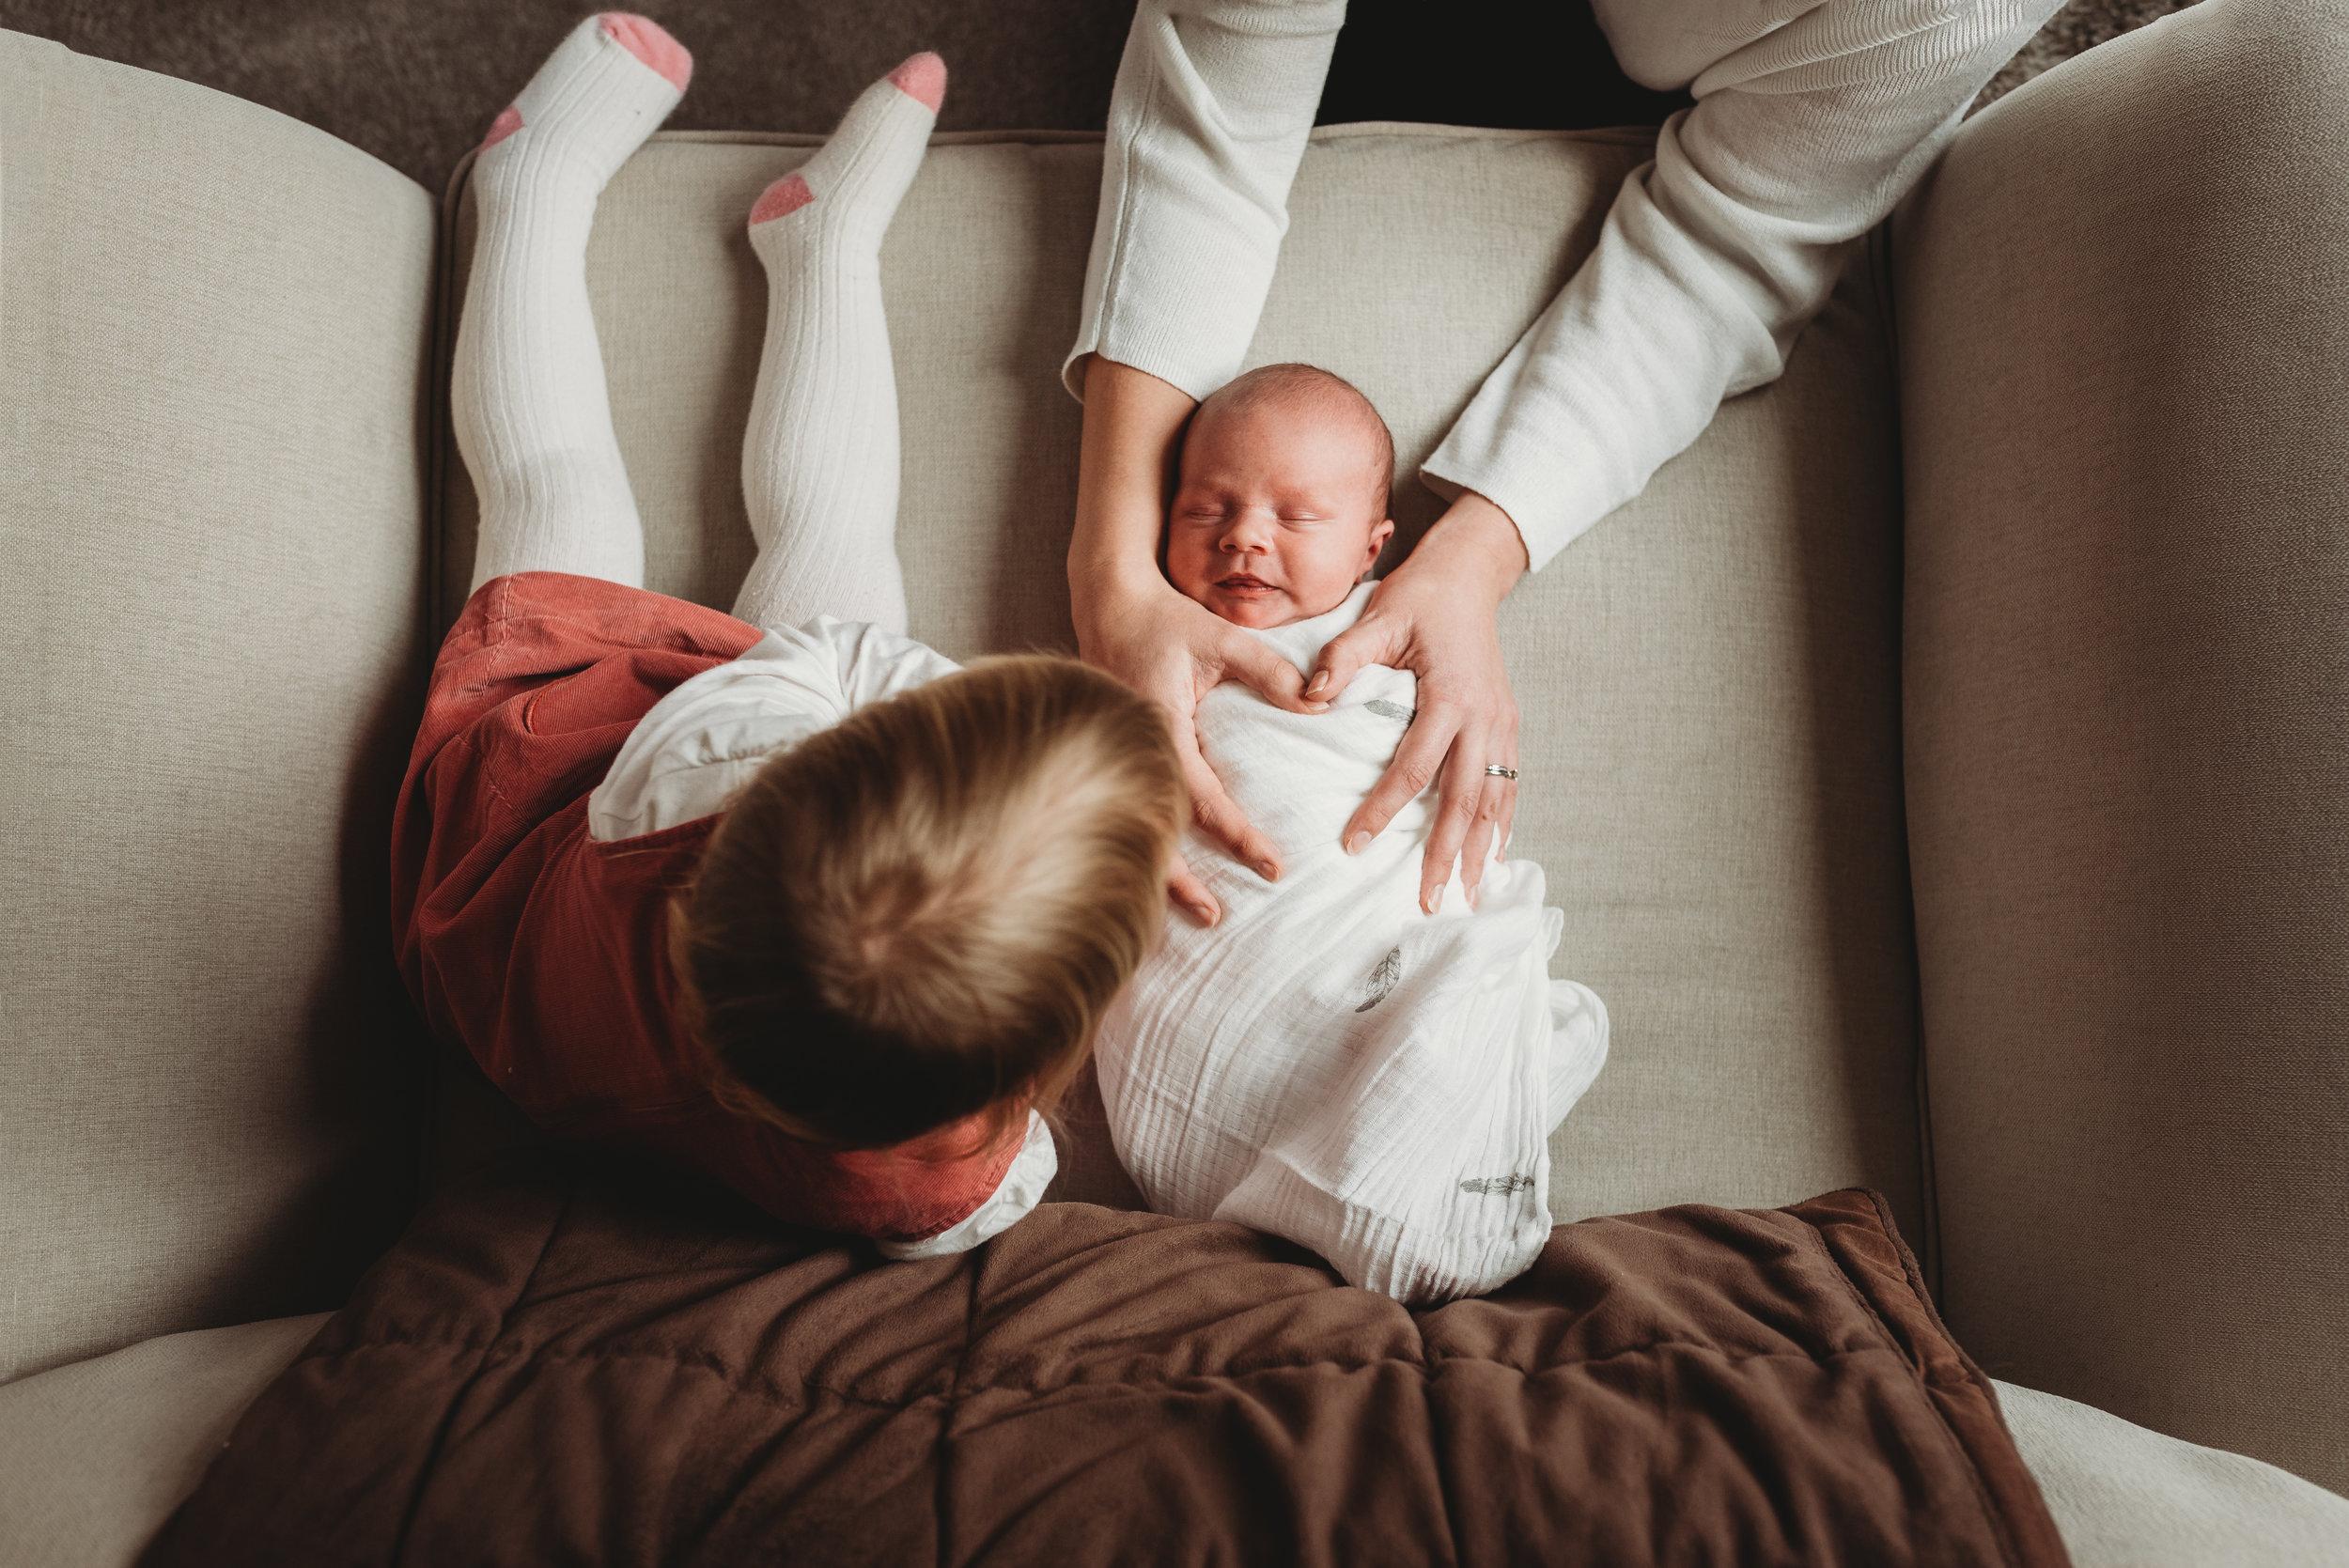 Sibling photo. Bug sister comforts newborn baby sister.